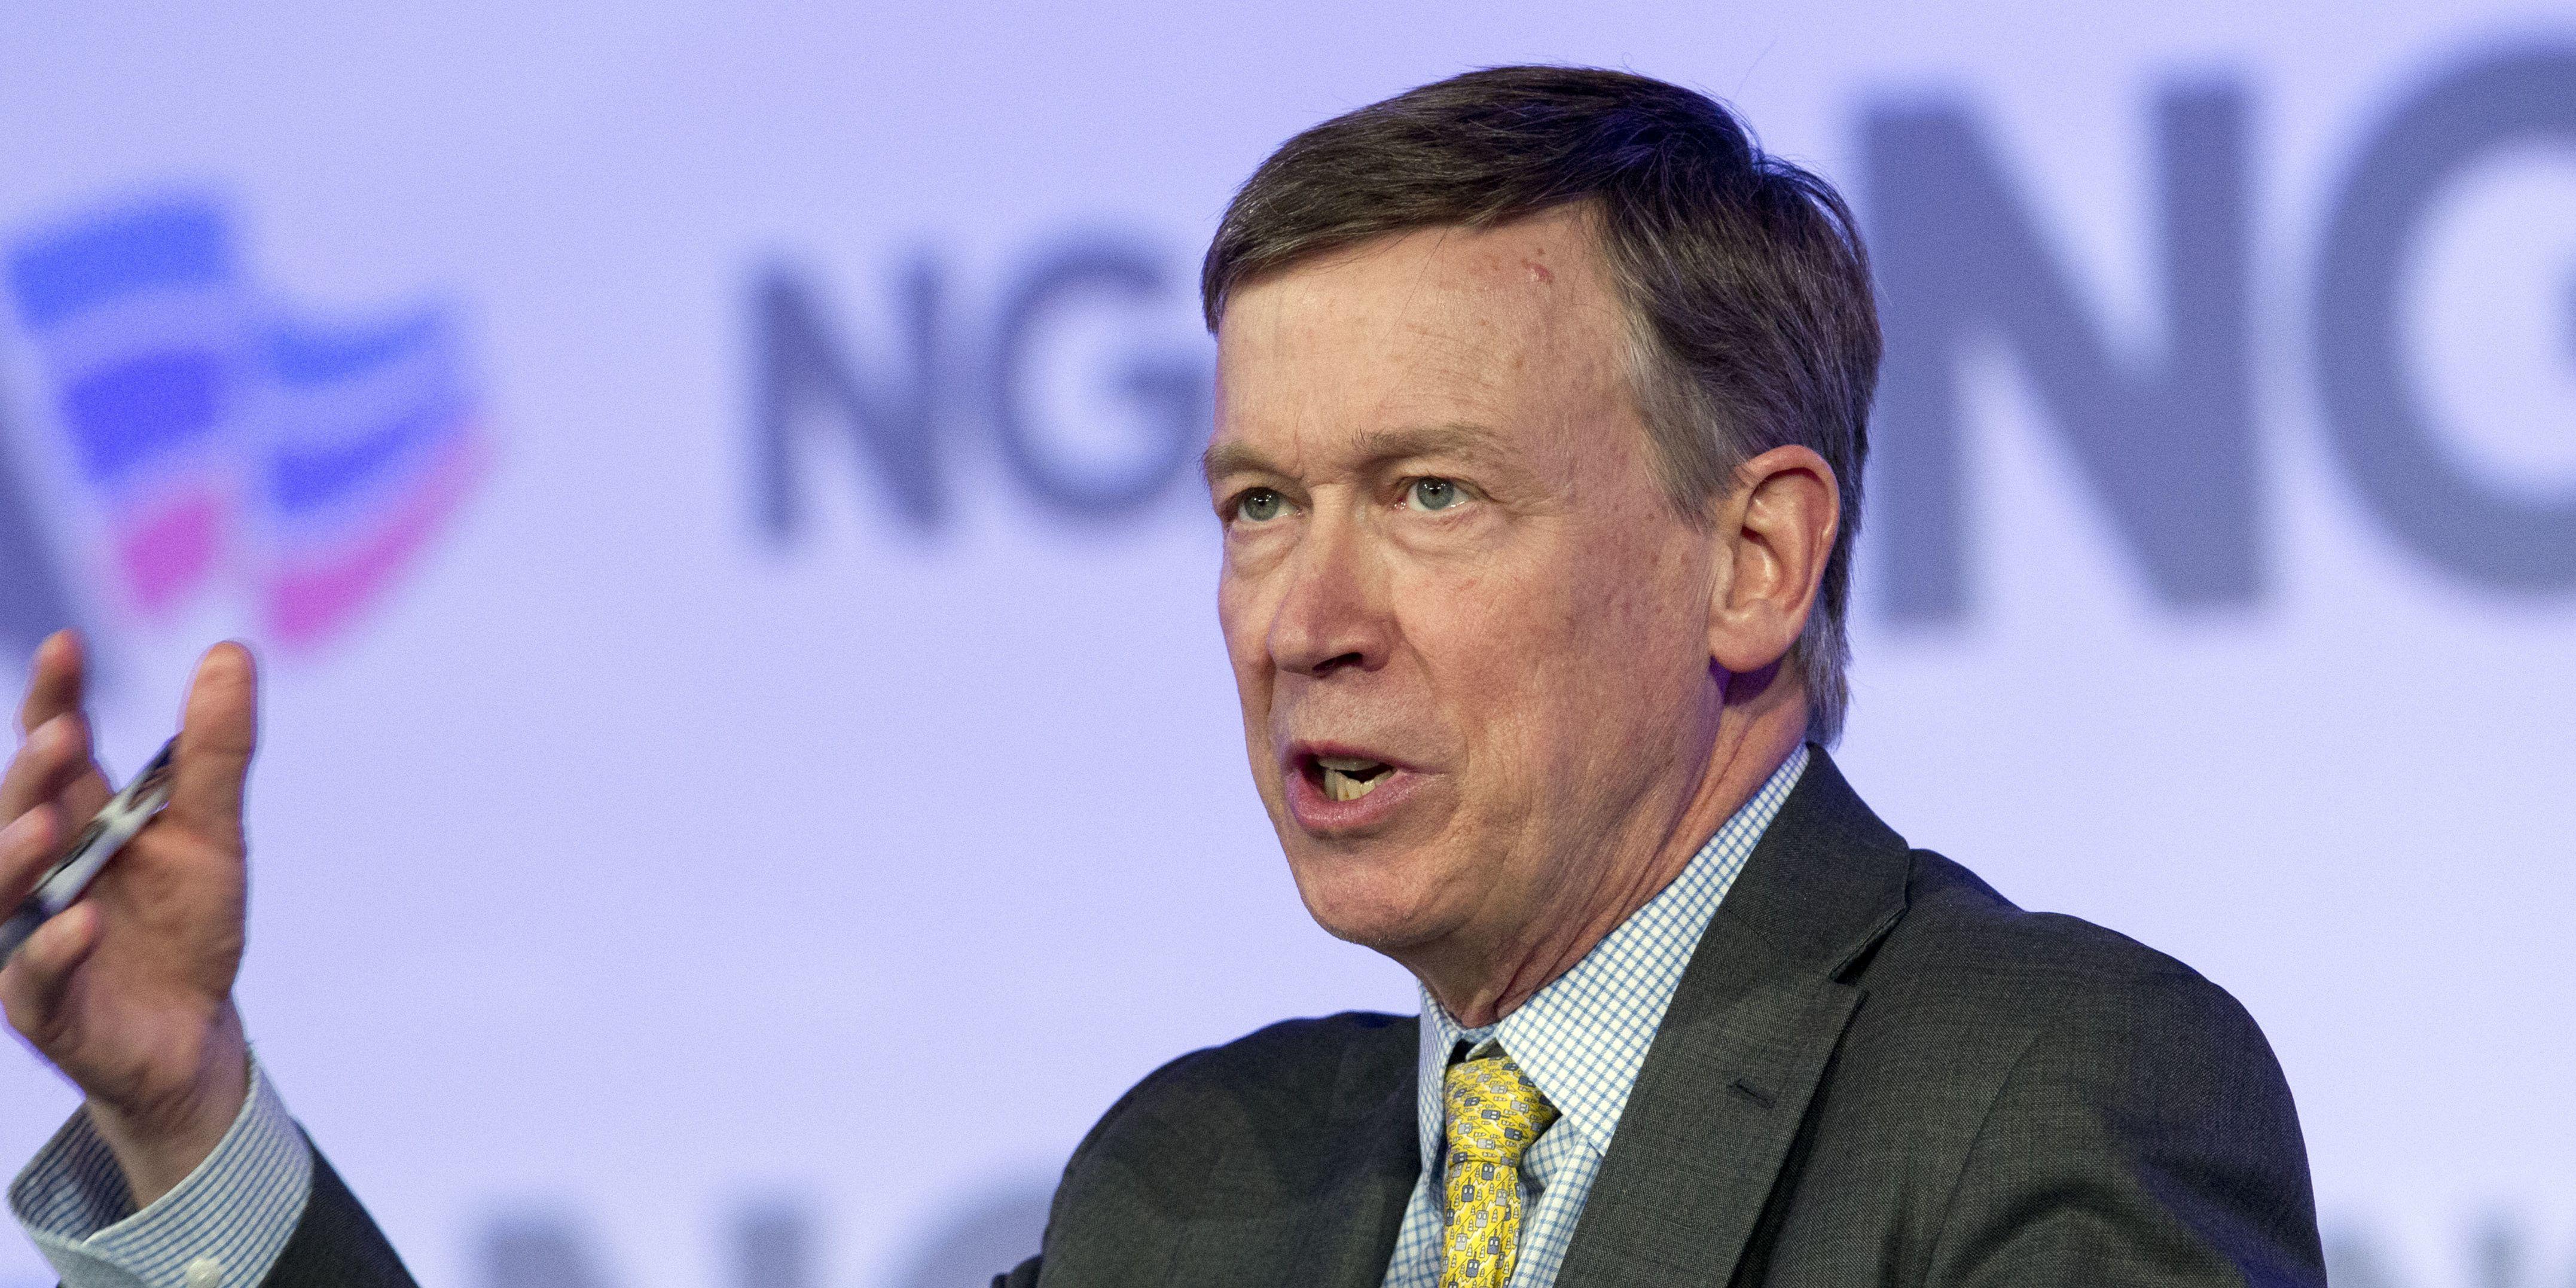 John Hickenlooper ends 2020 presidential bid